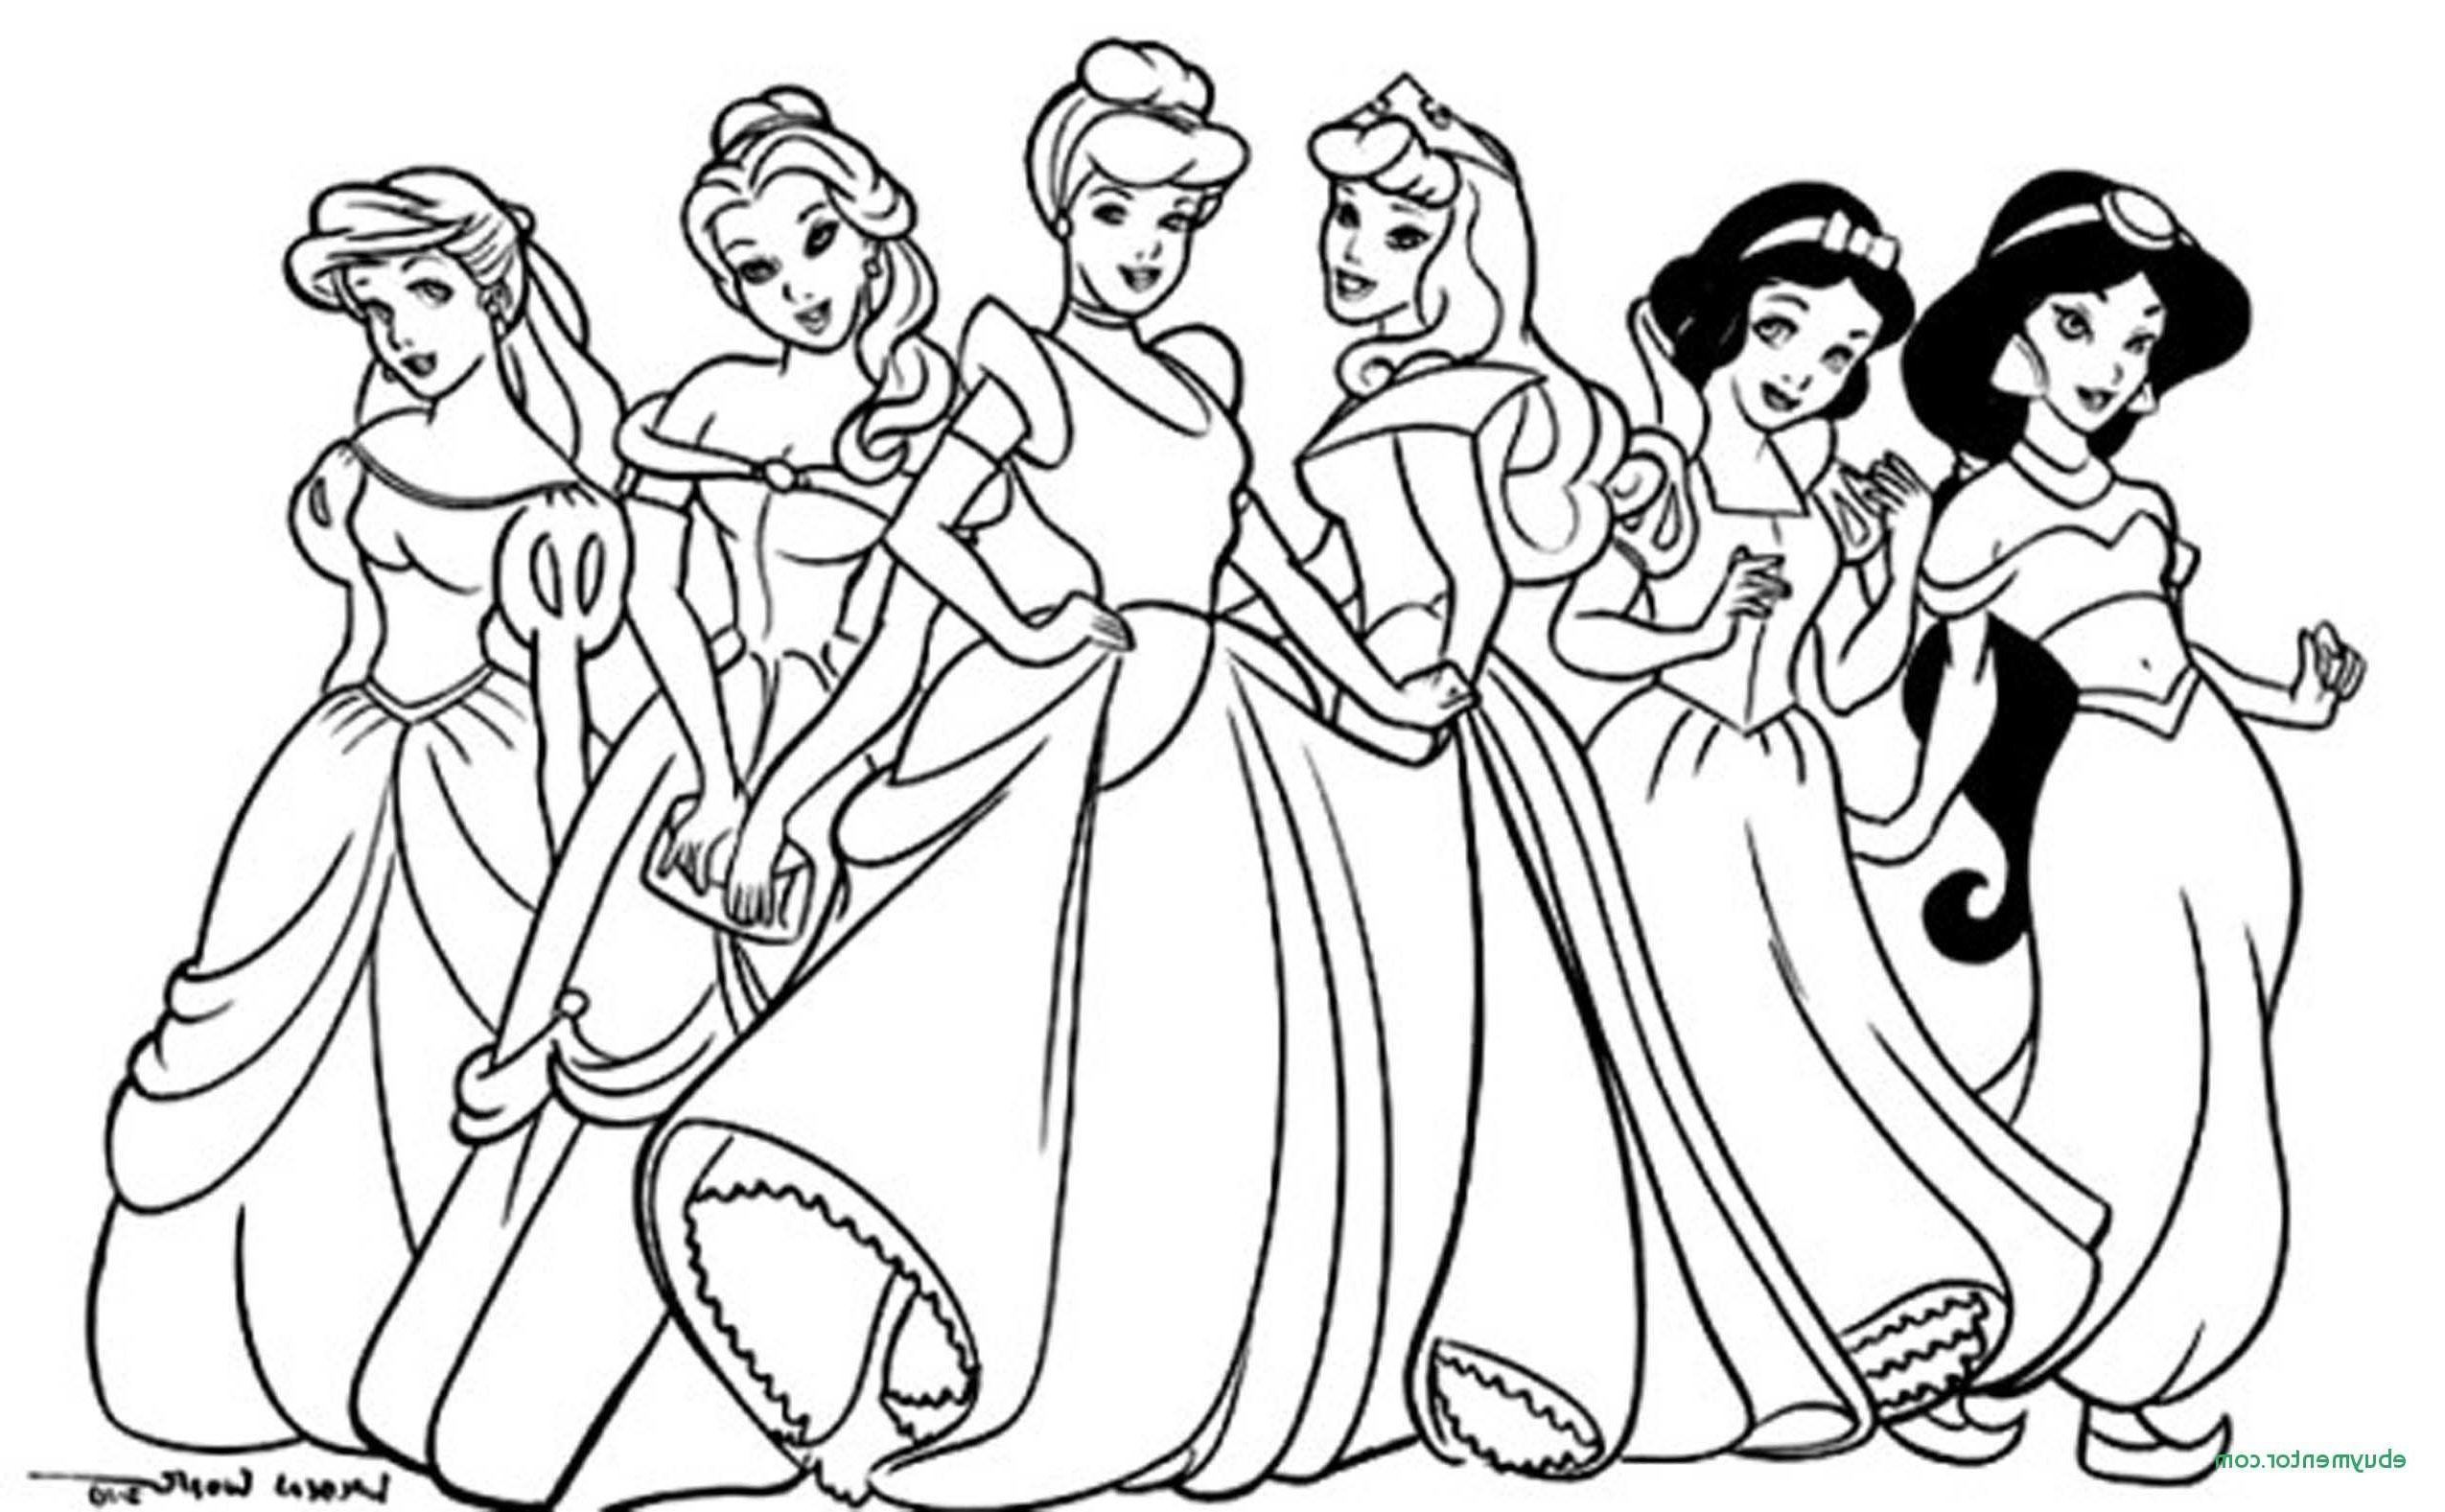 Free Disney Princess Coloring Pages Princess Coloring Pages Disney Princess Colors Princess Coloring